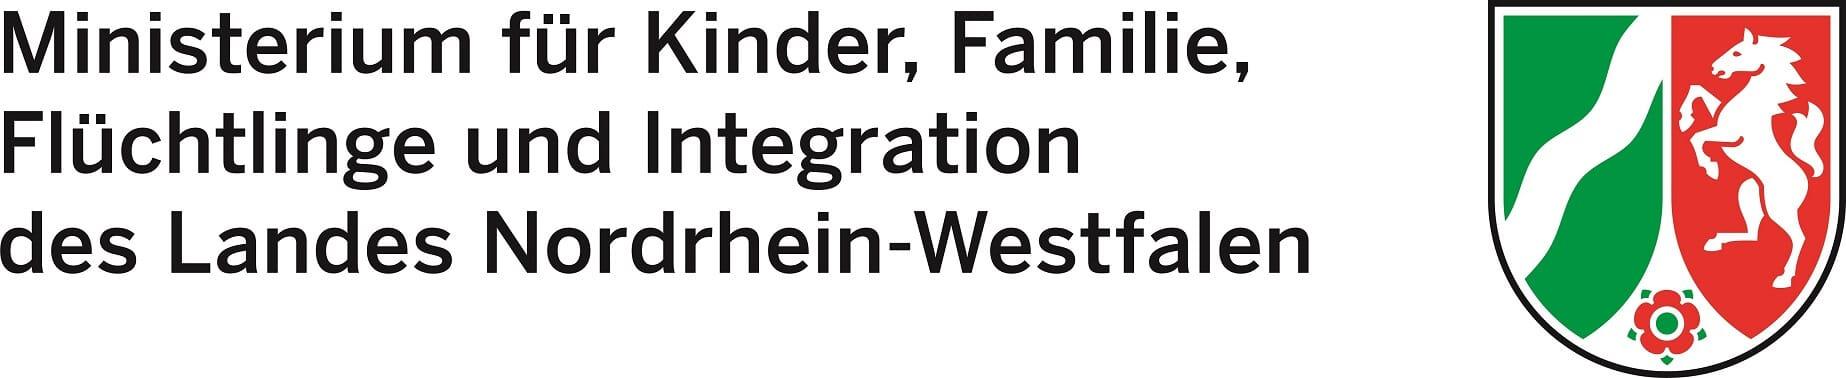 Logo des Ministeriums für Kinder, Familie, Flüchtlinge und Integration des Landes NRW